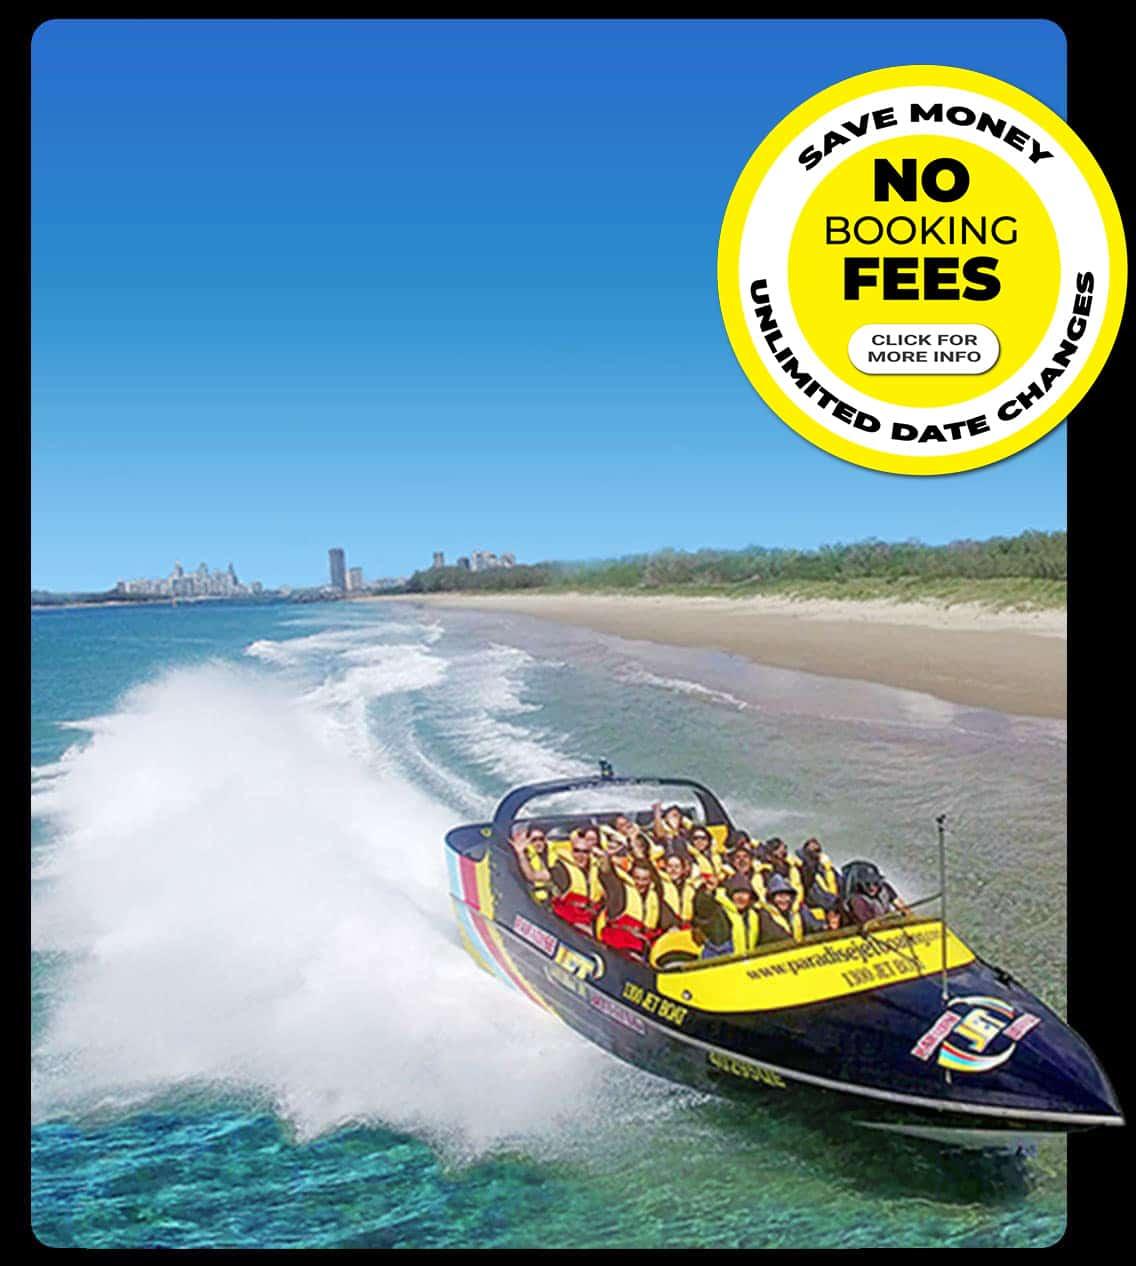 Jet-Boat-Gold-Coast-No-Fees-Mobile